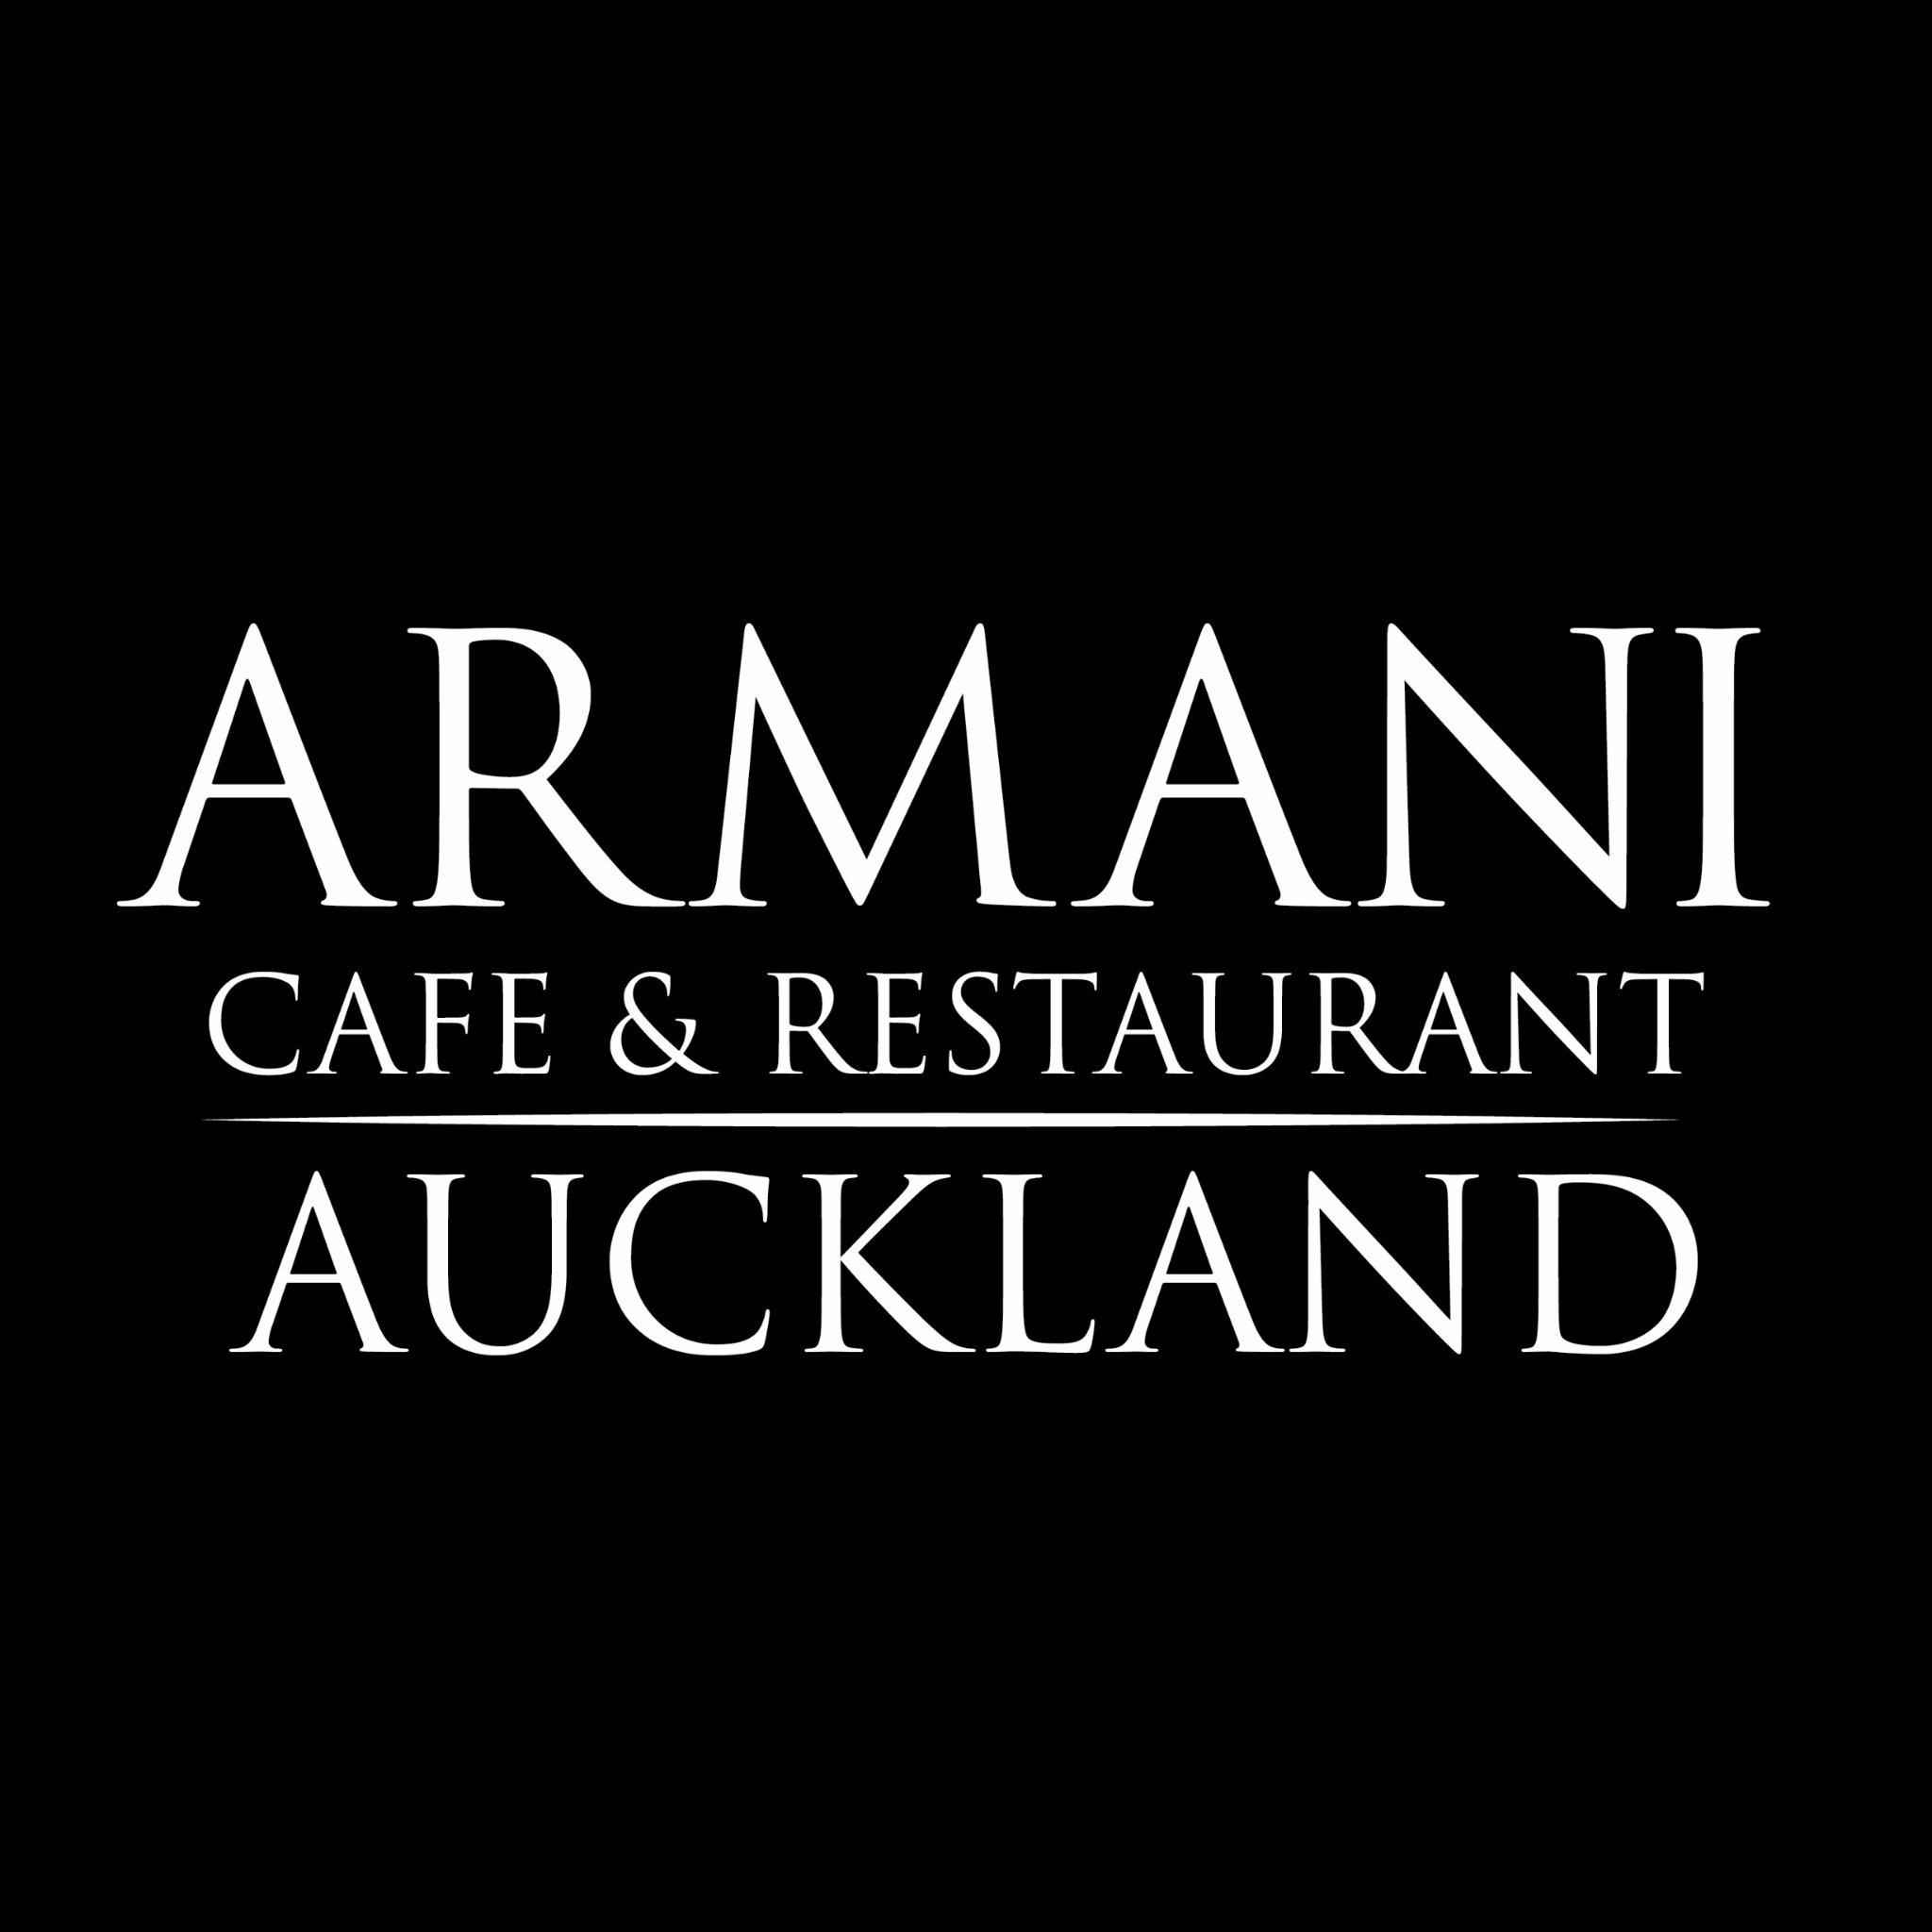 Armani Cafe AKL